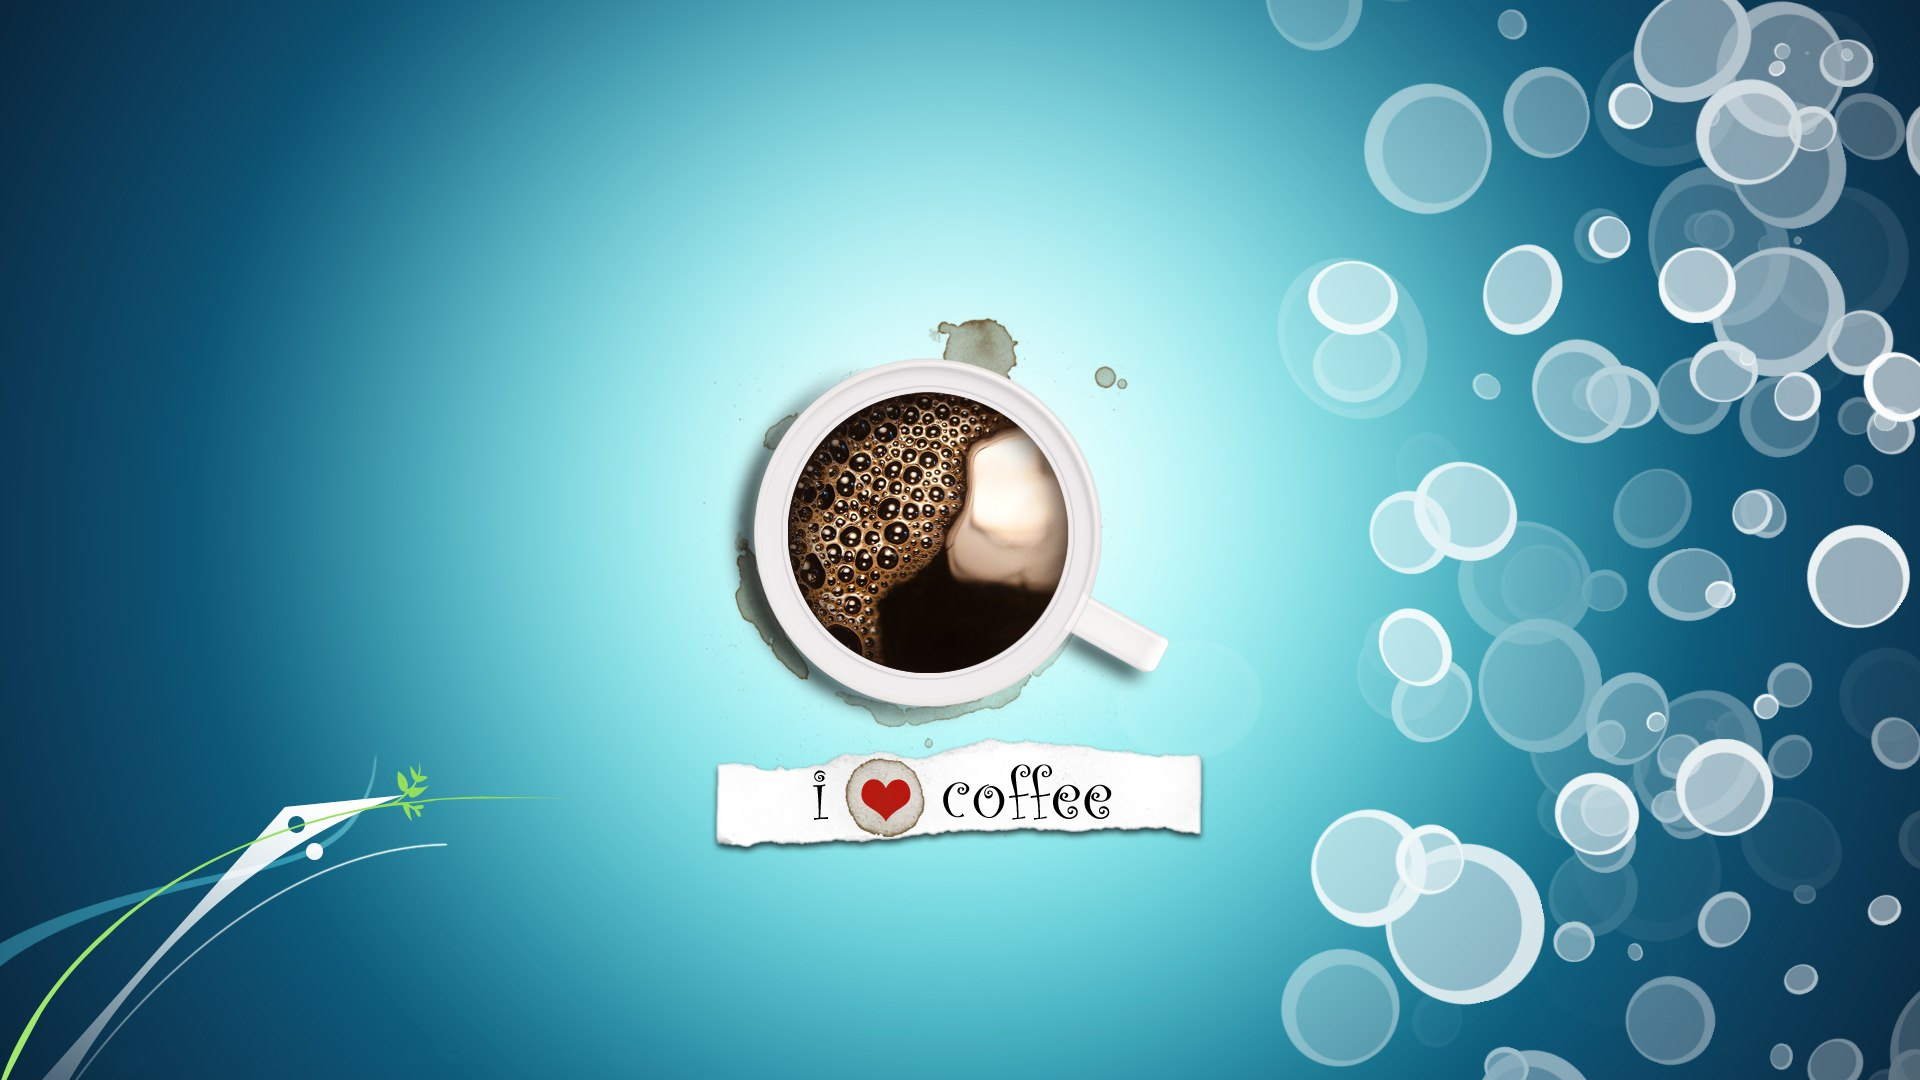 cool coffee wallpaper